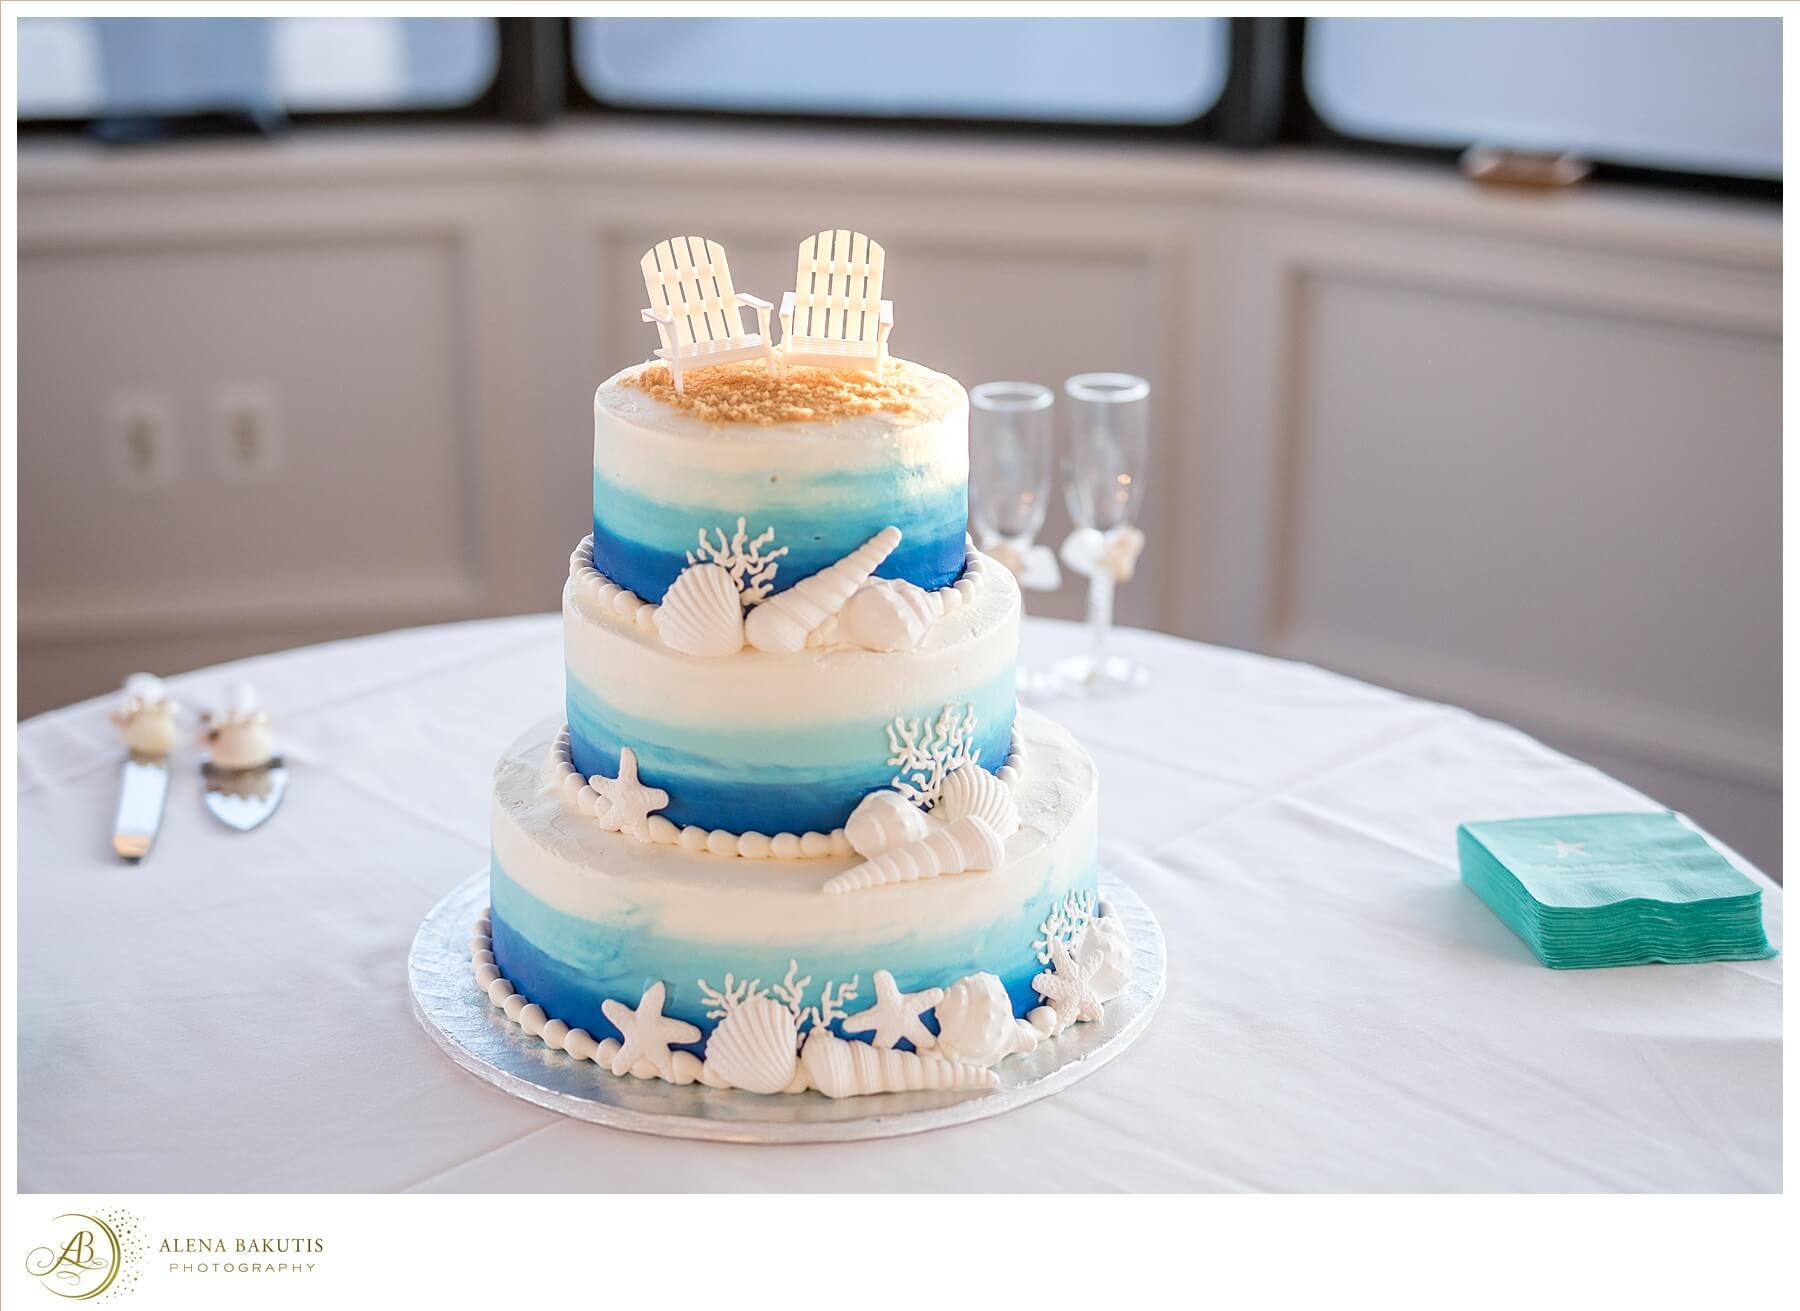 destin wedding cakes Alena Bakutis Photography - Amber Brandon-490_WEB